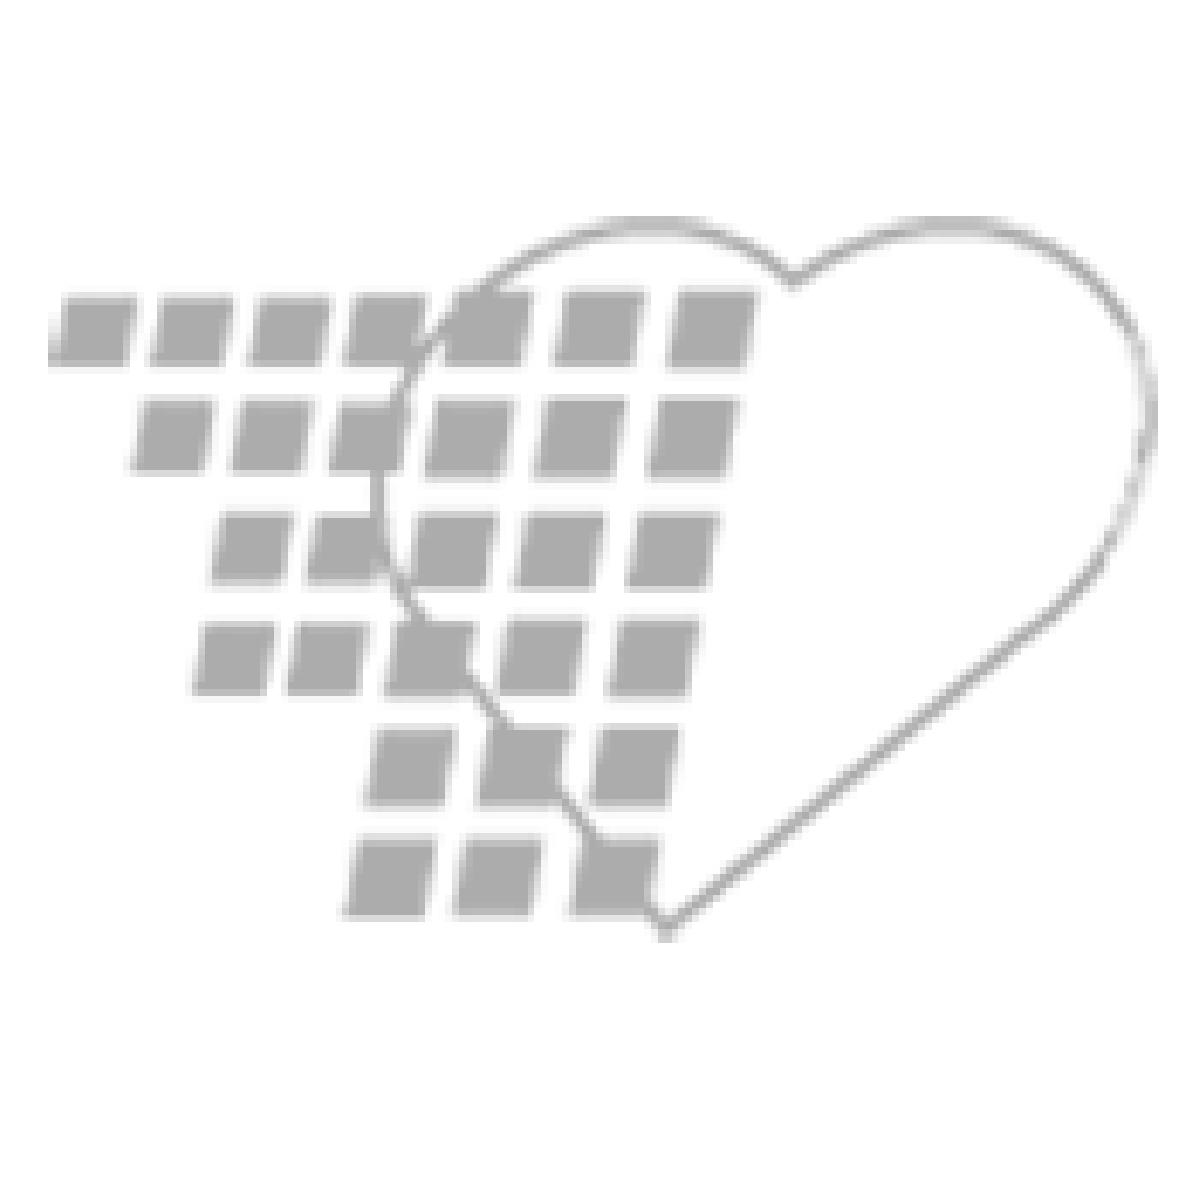 12-21-9607 - Jelco® Saf-T Holder® Device - Pediatric Non-sterile